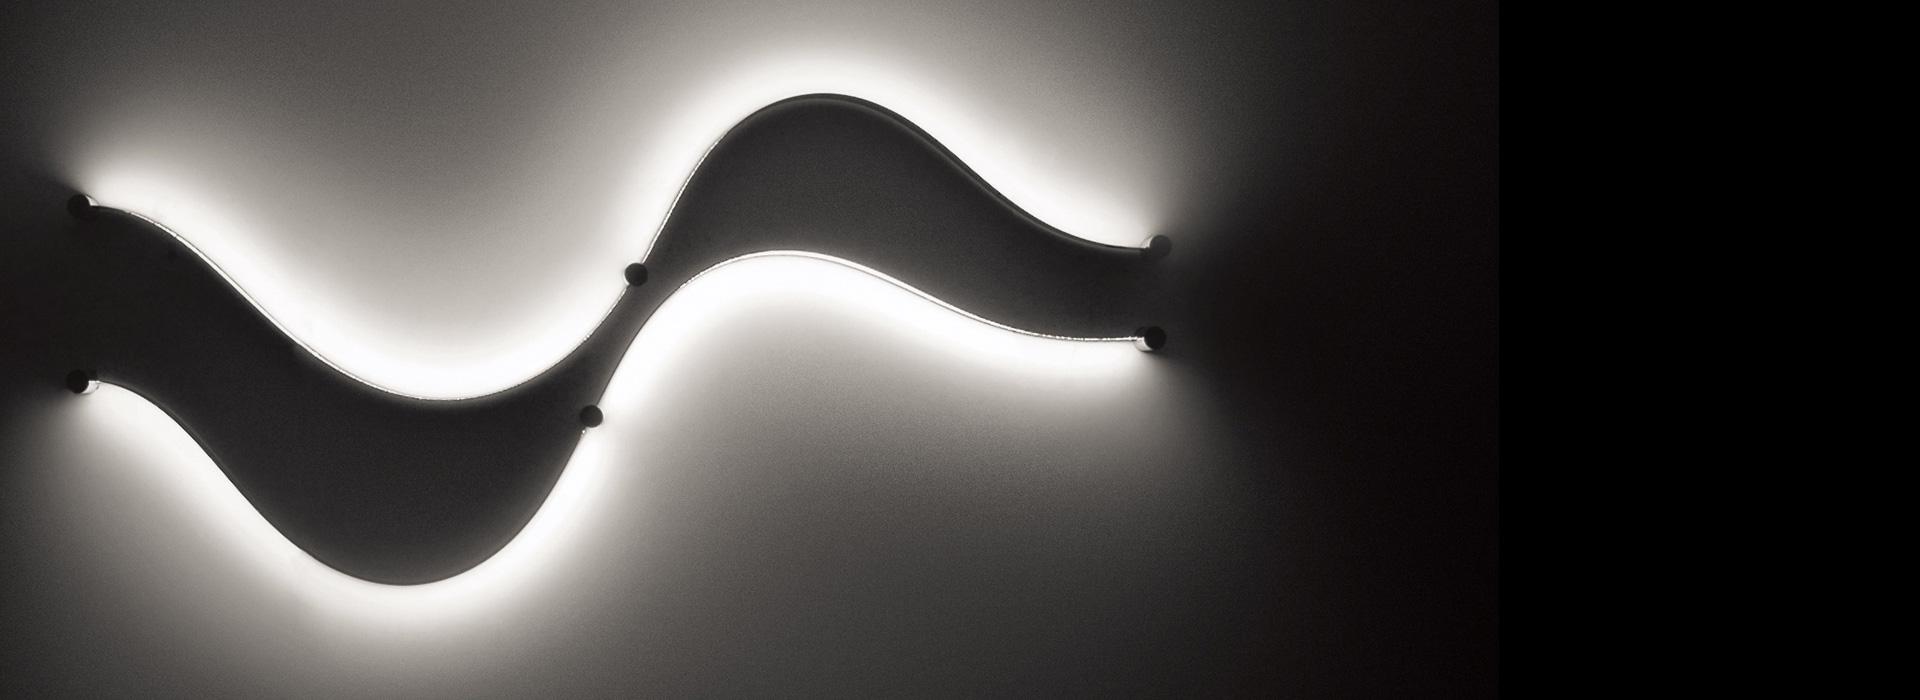 Cini & Nils - Zaneen: distributor for design lighting in North America